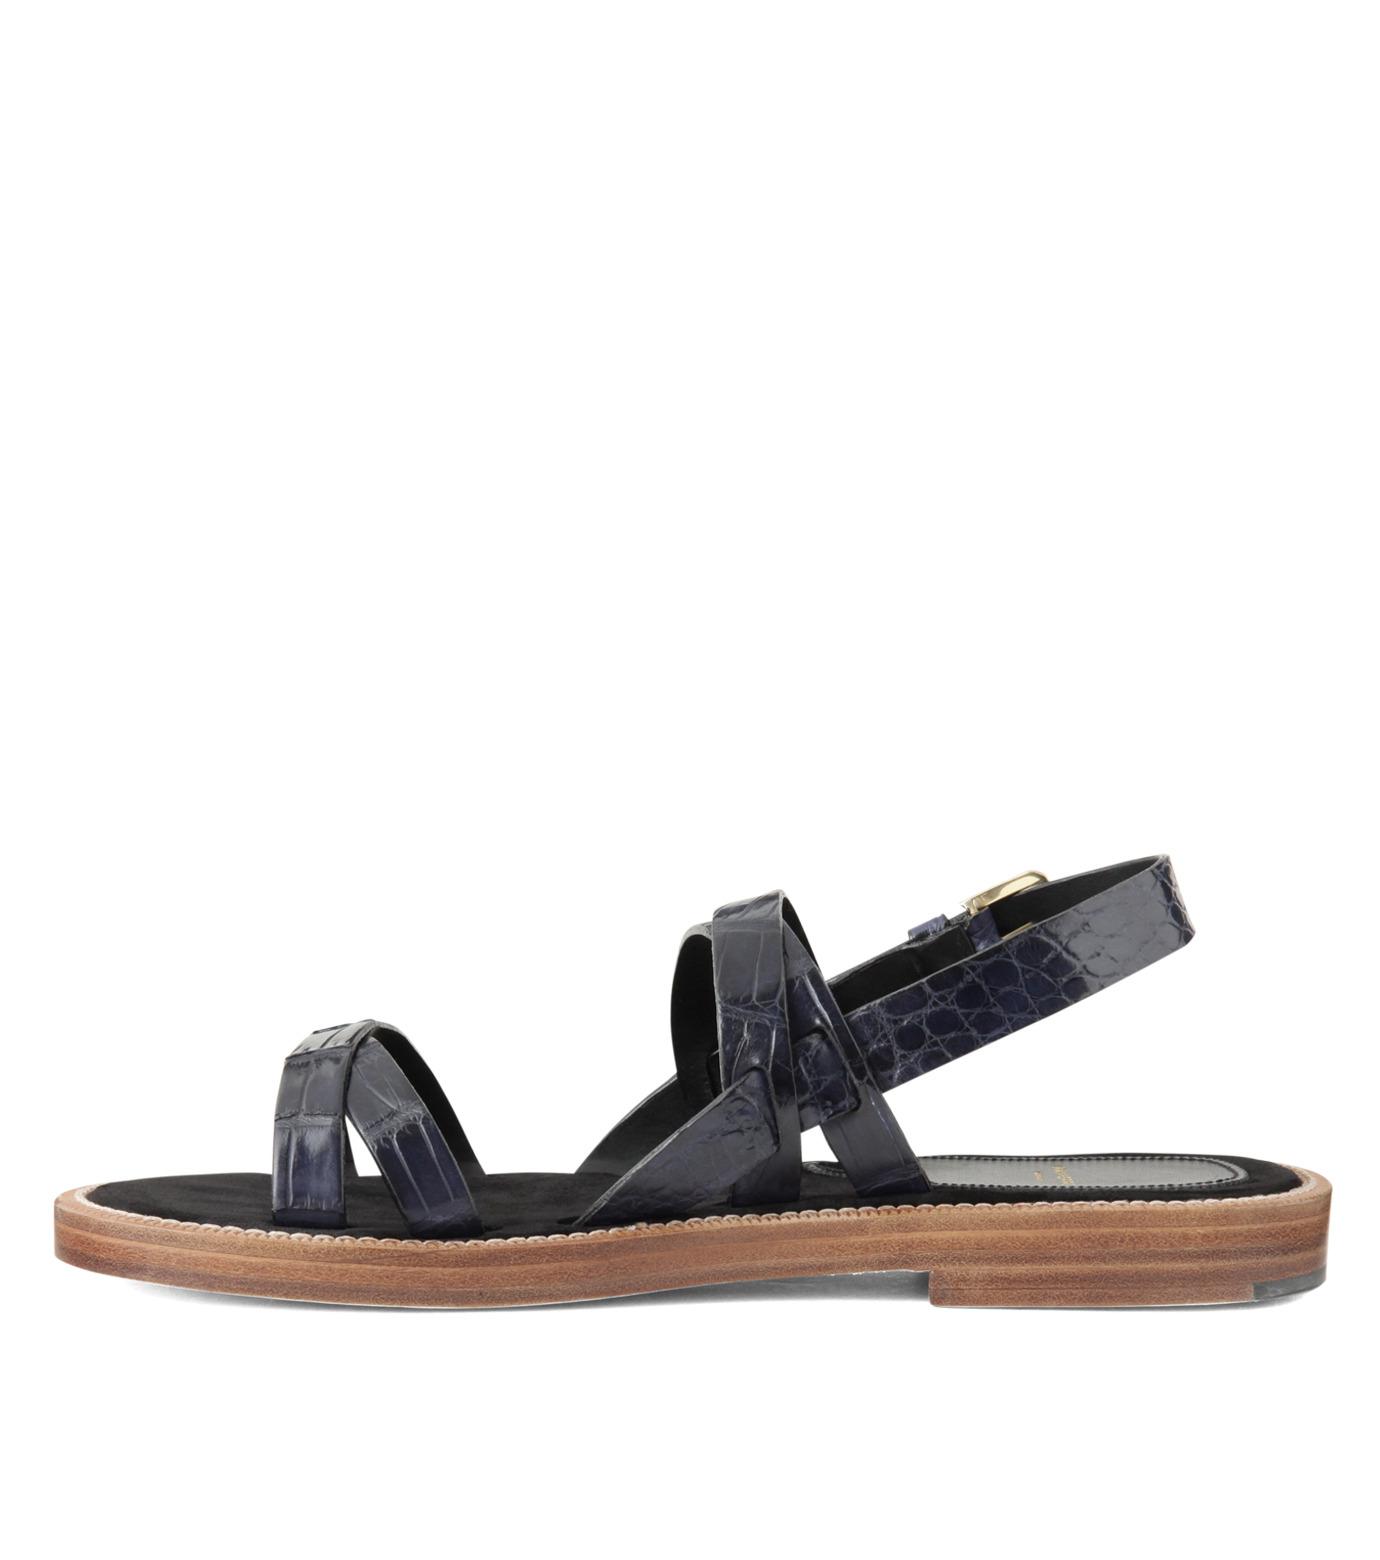 Max Verre(マックス ヴェッレ)のCross Strap Sandal-BLUE(シューズ/shoes)-MV918-POSITA-92 拡大詳細画像2